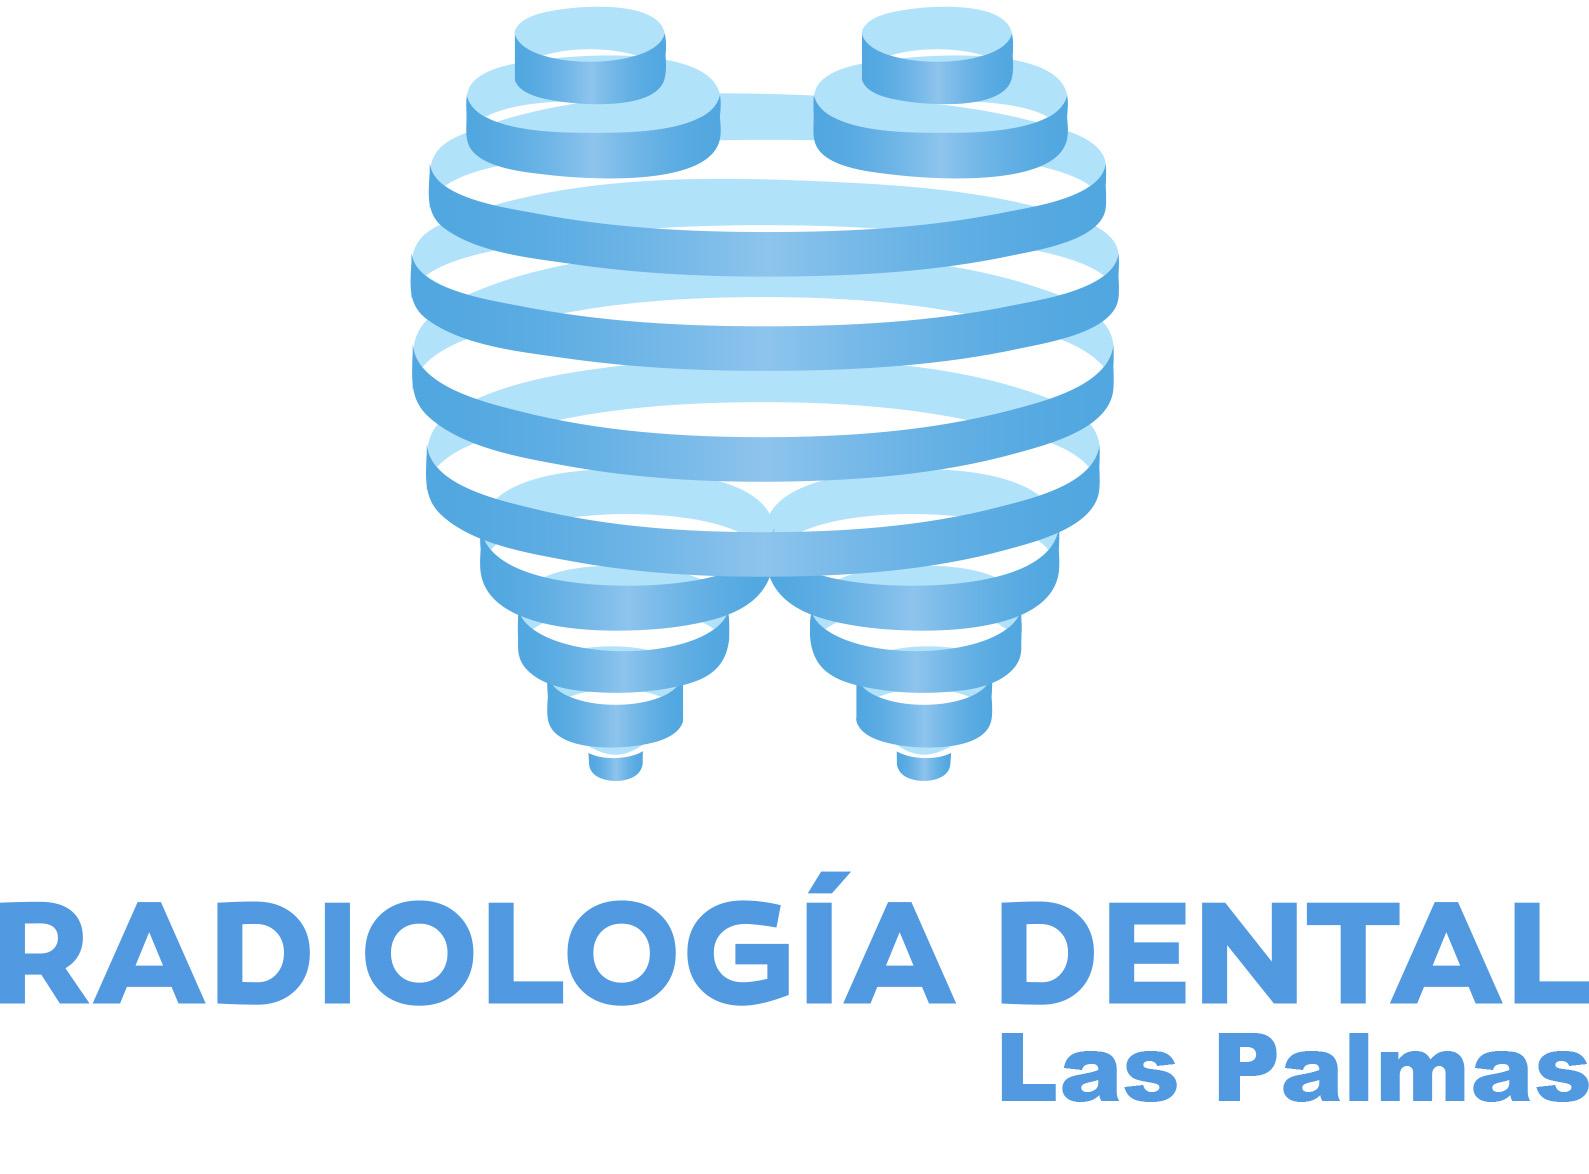 https://radiologiadentallaspalmas.com/wp-content/uploads/2019/07/logo.jpg